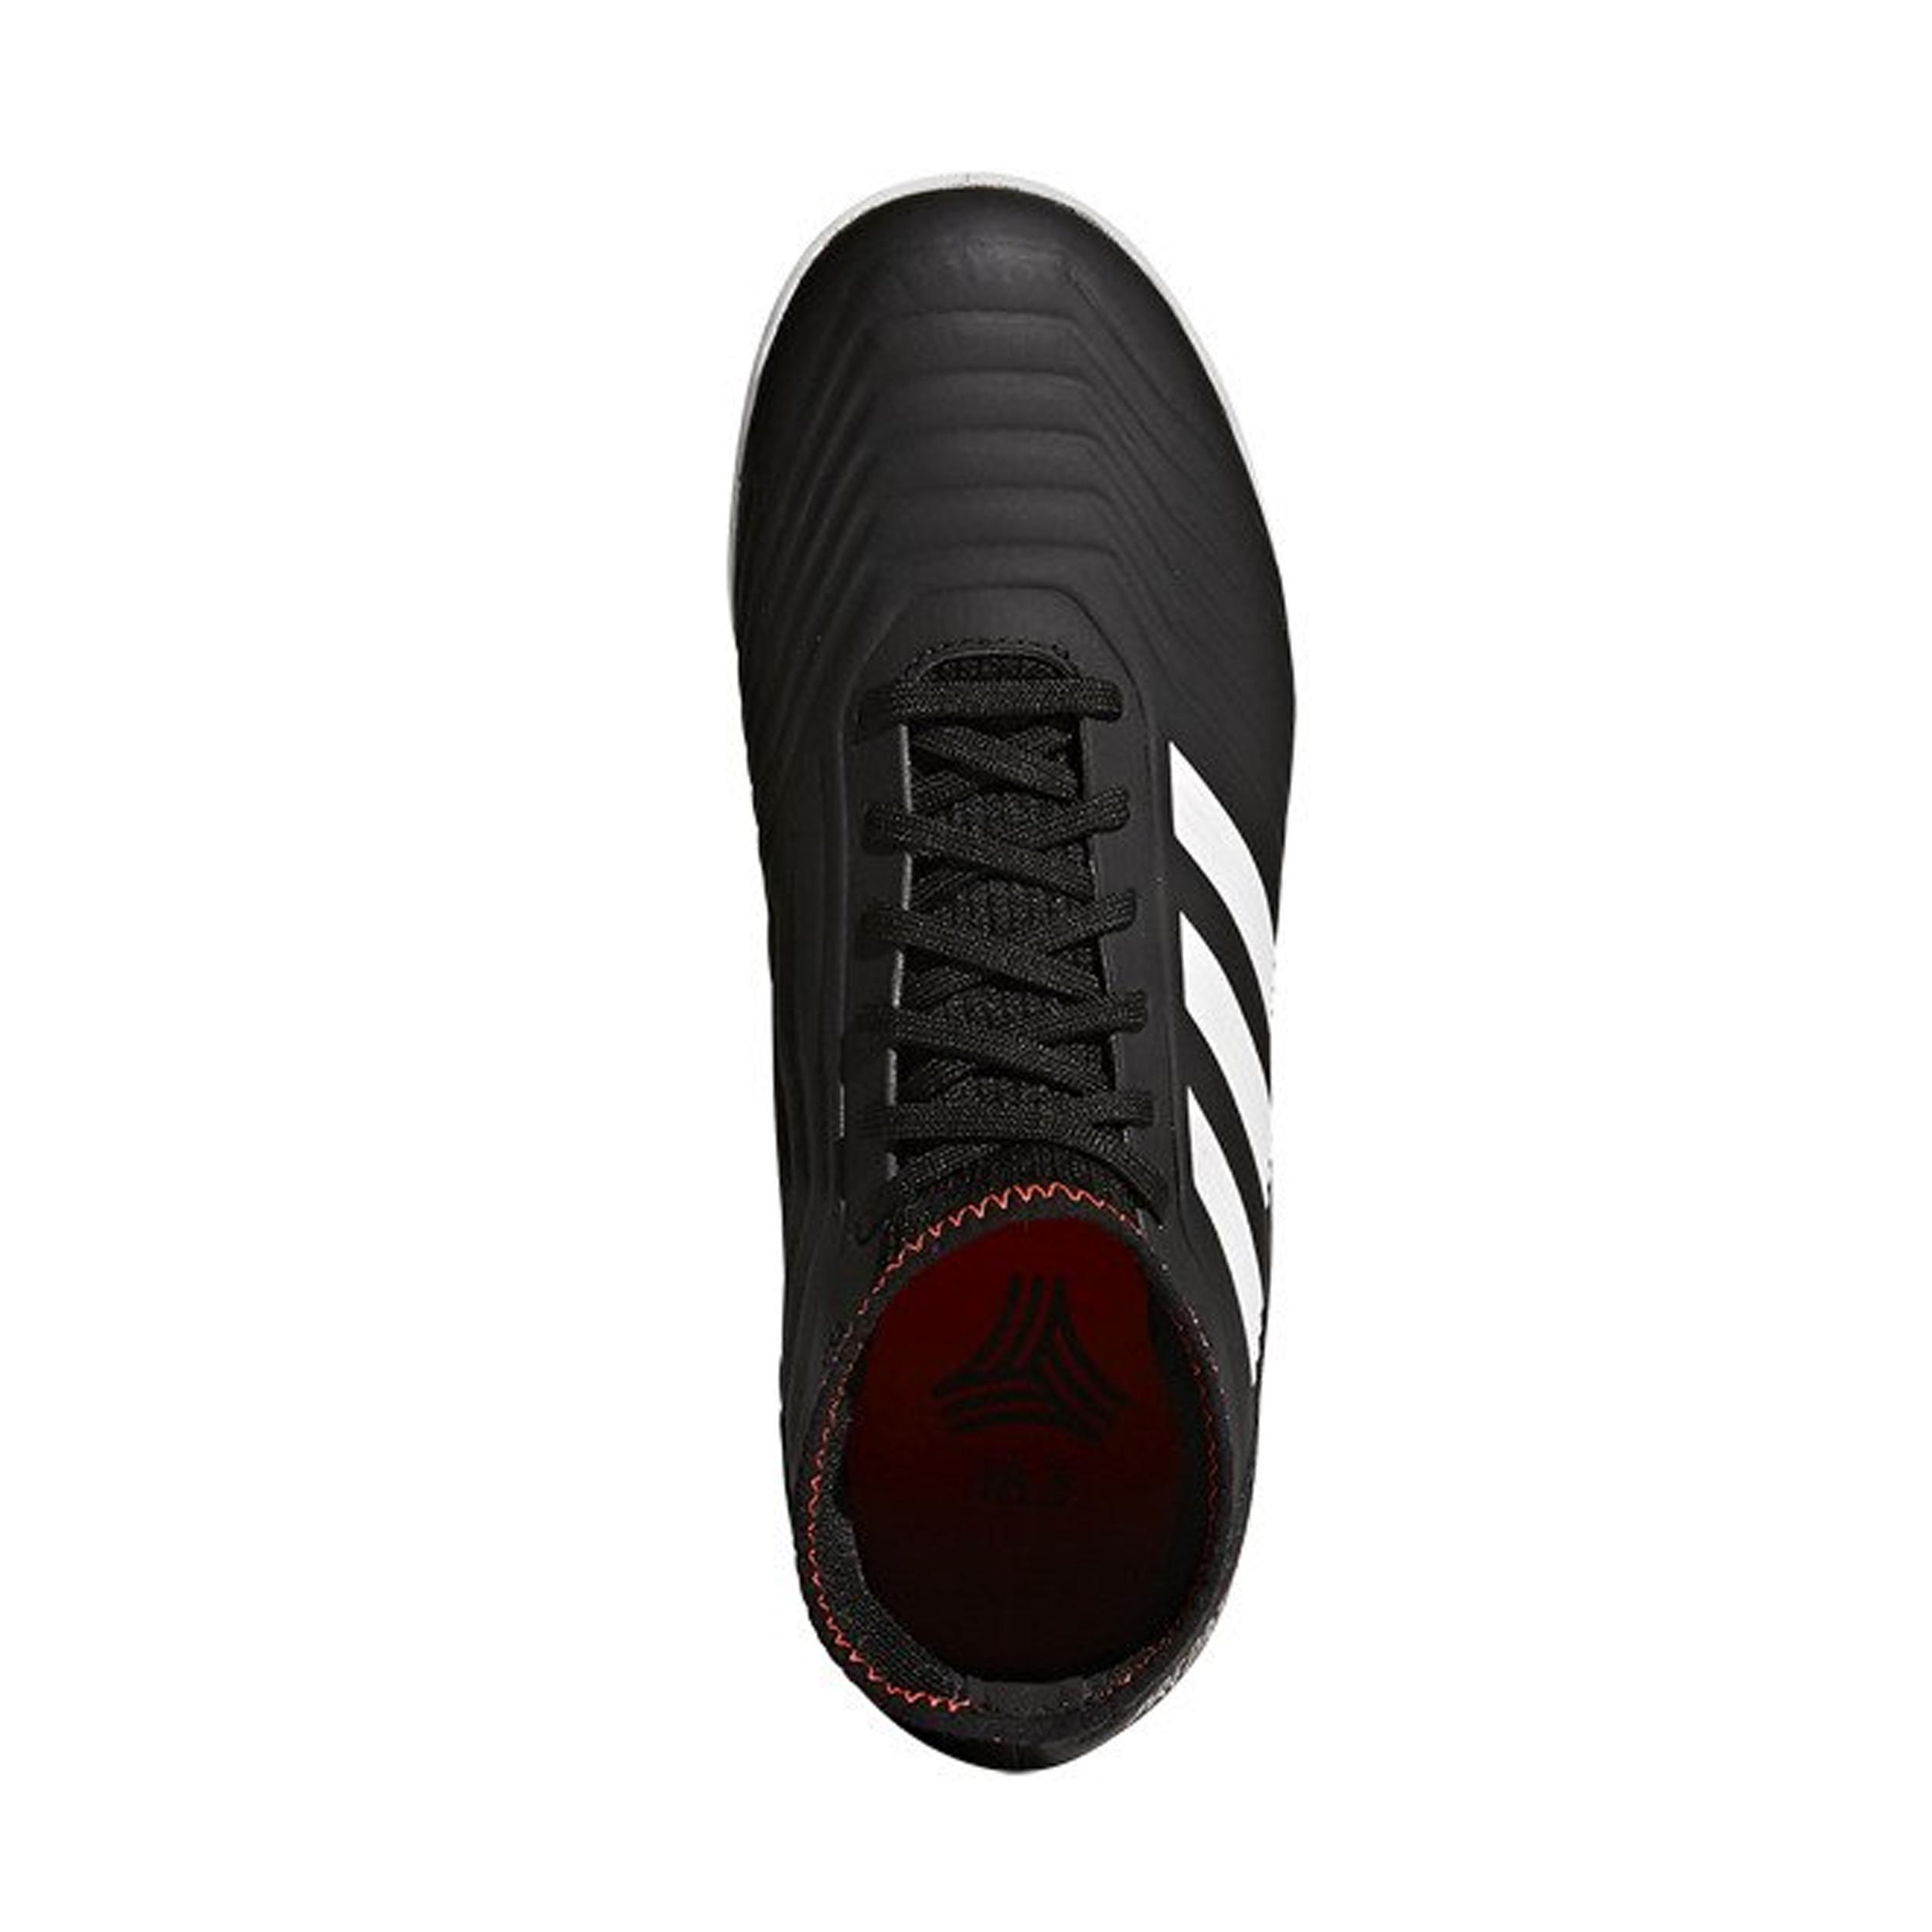 کفش مخصوص فوتسال پسرانه آدیداس سری Predator مدل CP9076 main 1 3